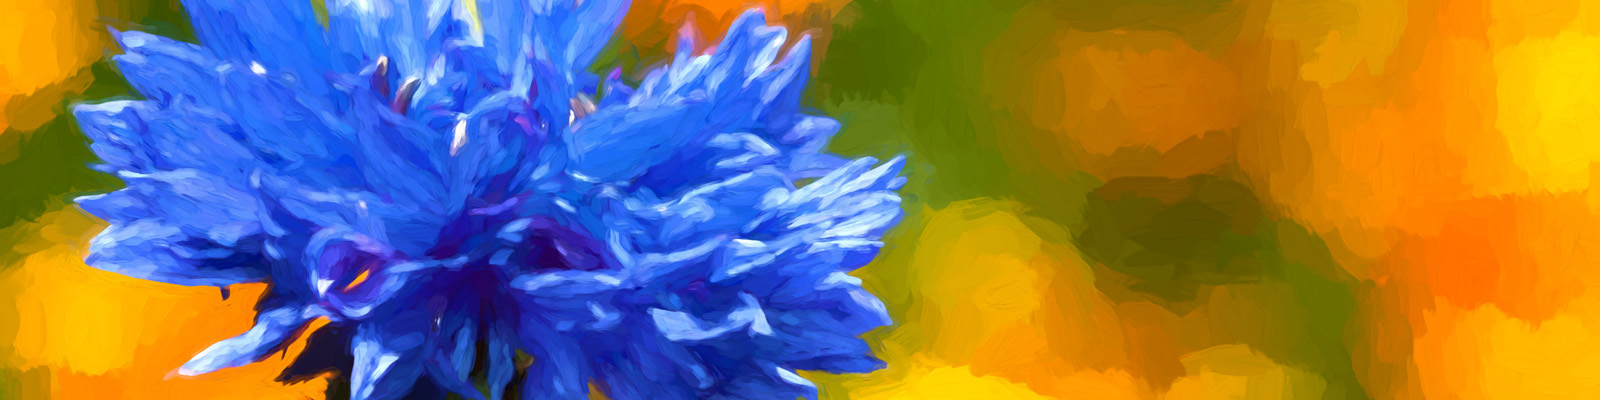 Kornblume als Gemälde